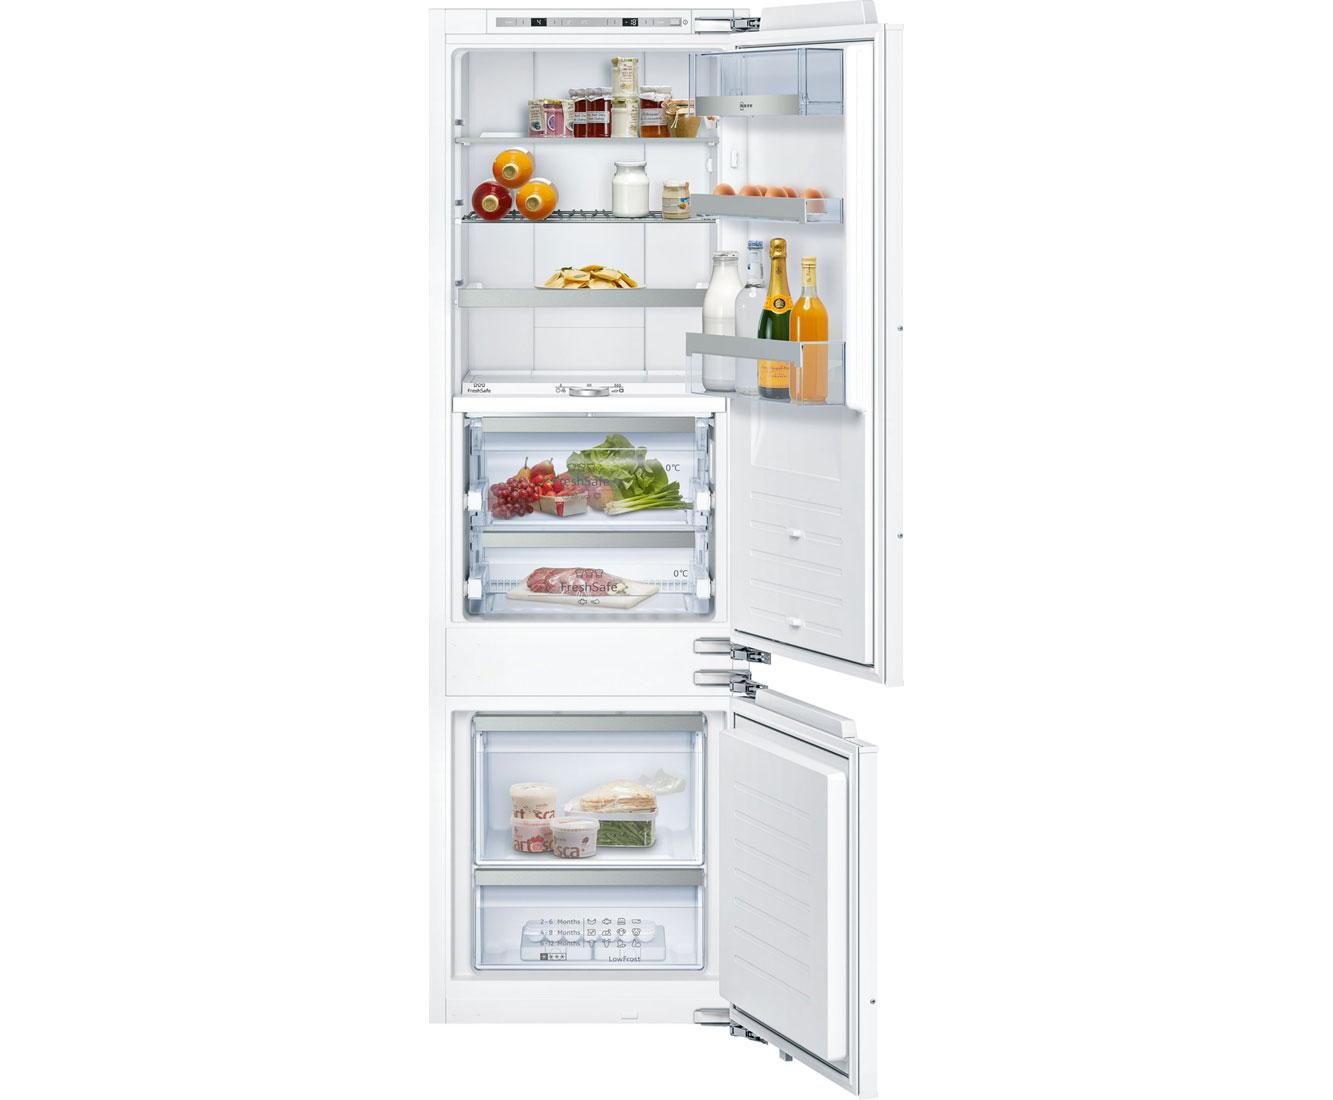 Neff Kühlschrank Side By Side : Neff [ki8875d40] kgn846h3 einbau kühl gefrierkombination 178er